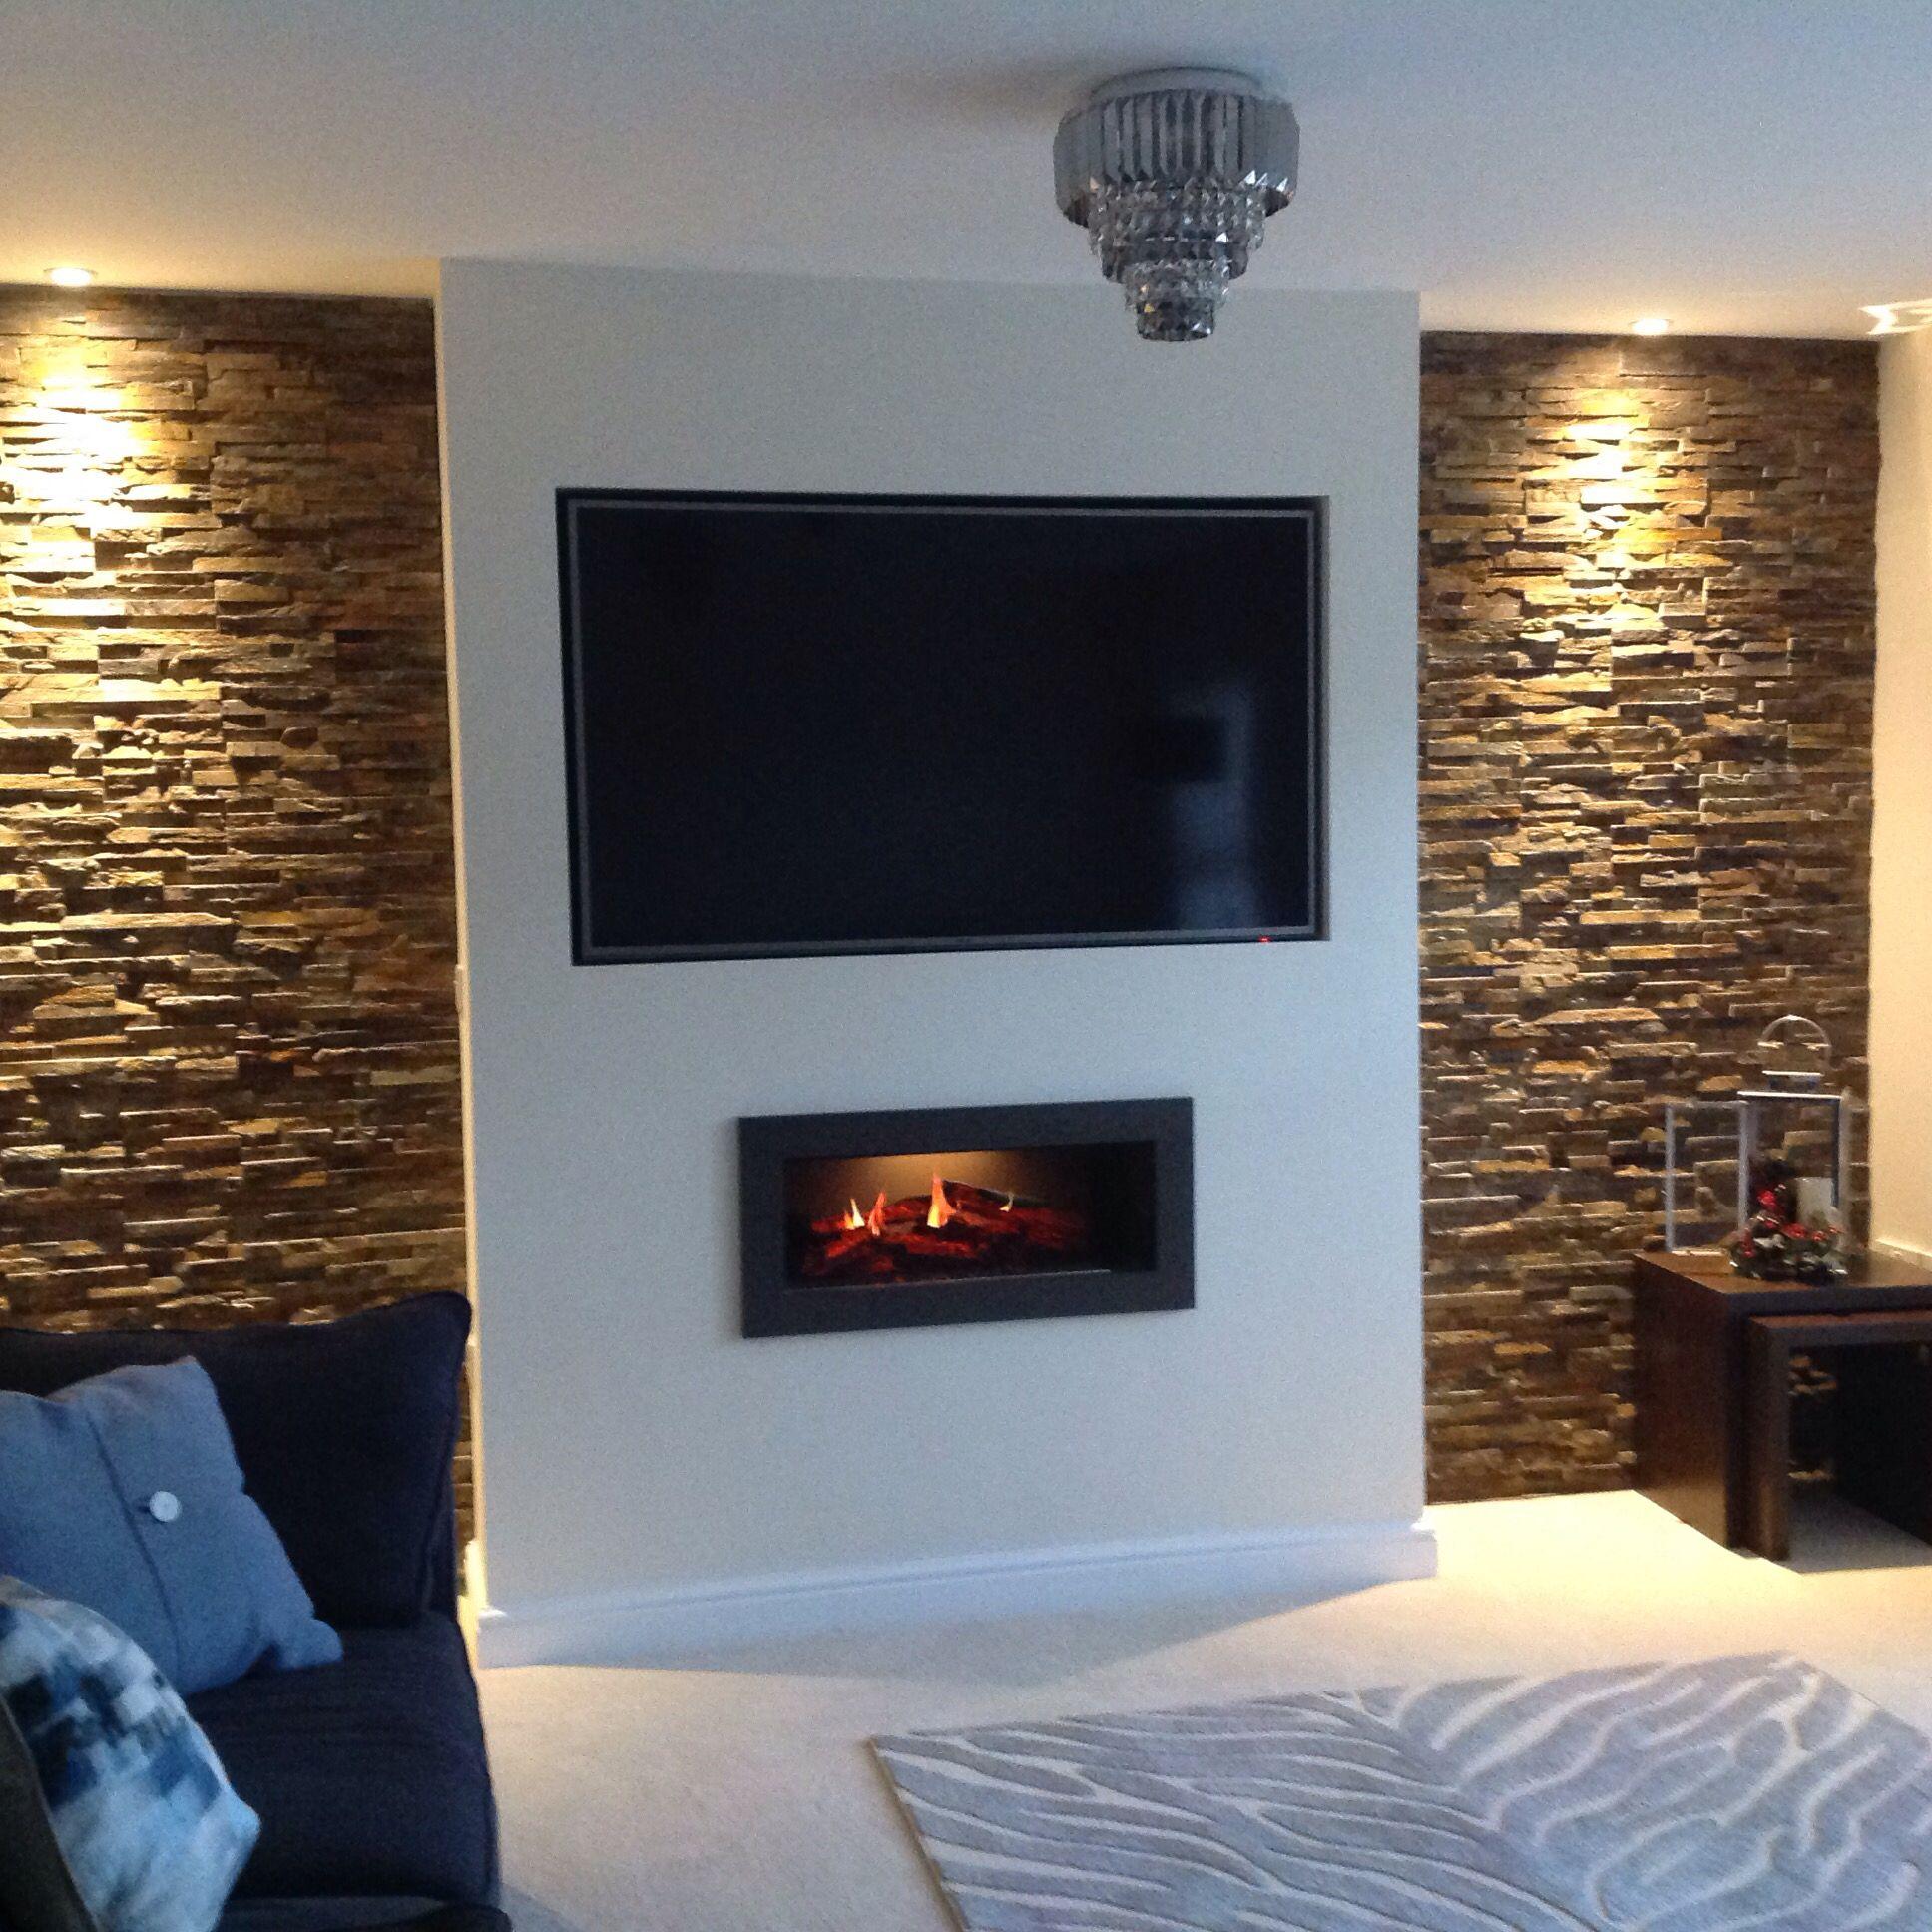 Wall Mounted Tv Ideas Above Fireplace | Euffslemani.com